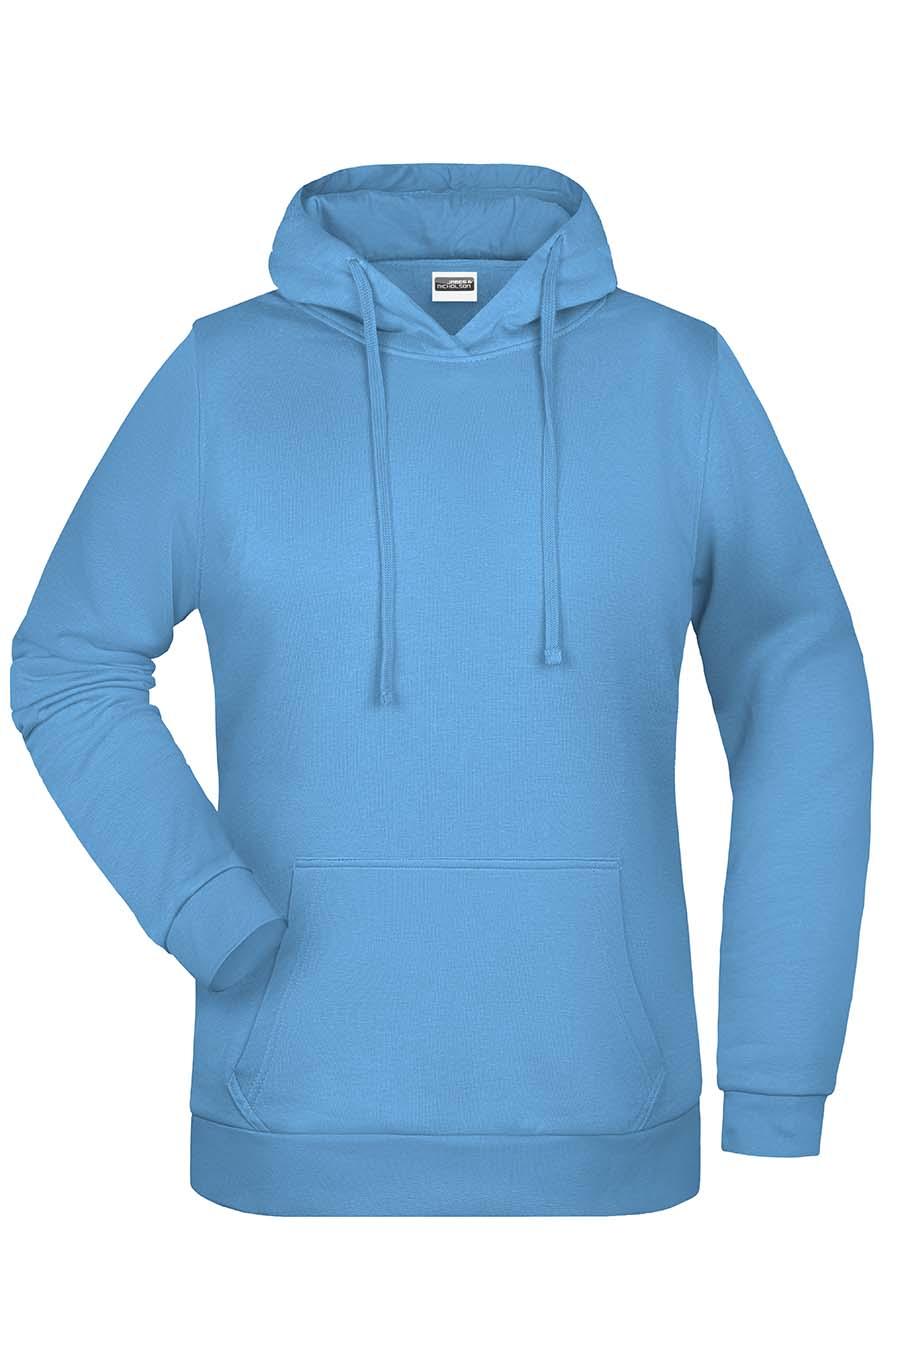 Sweat-shirt capuche femme - 20-1494-19